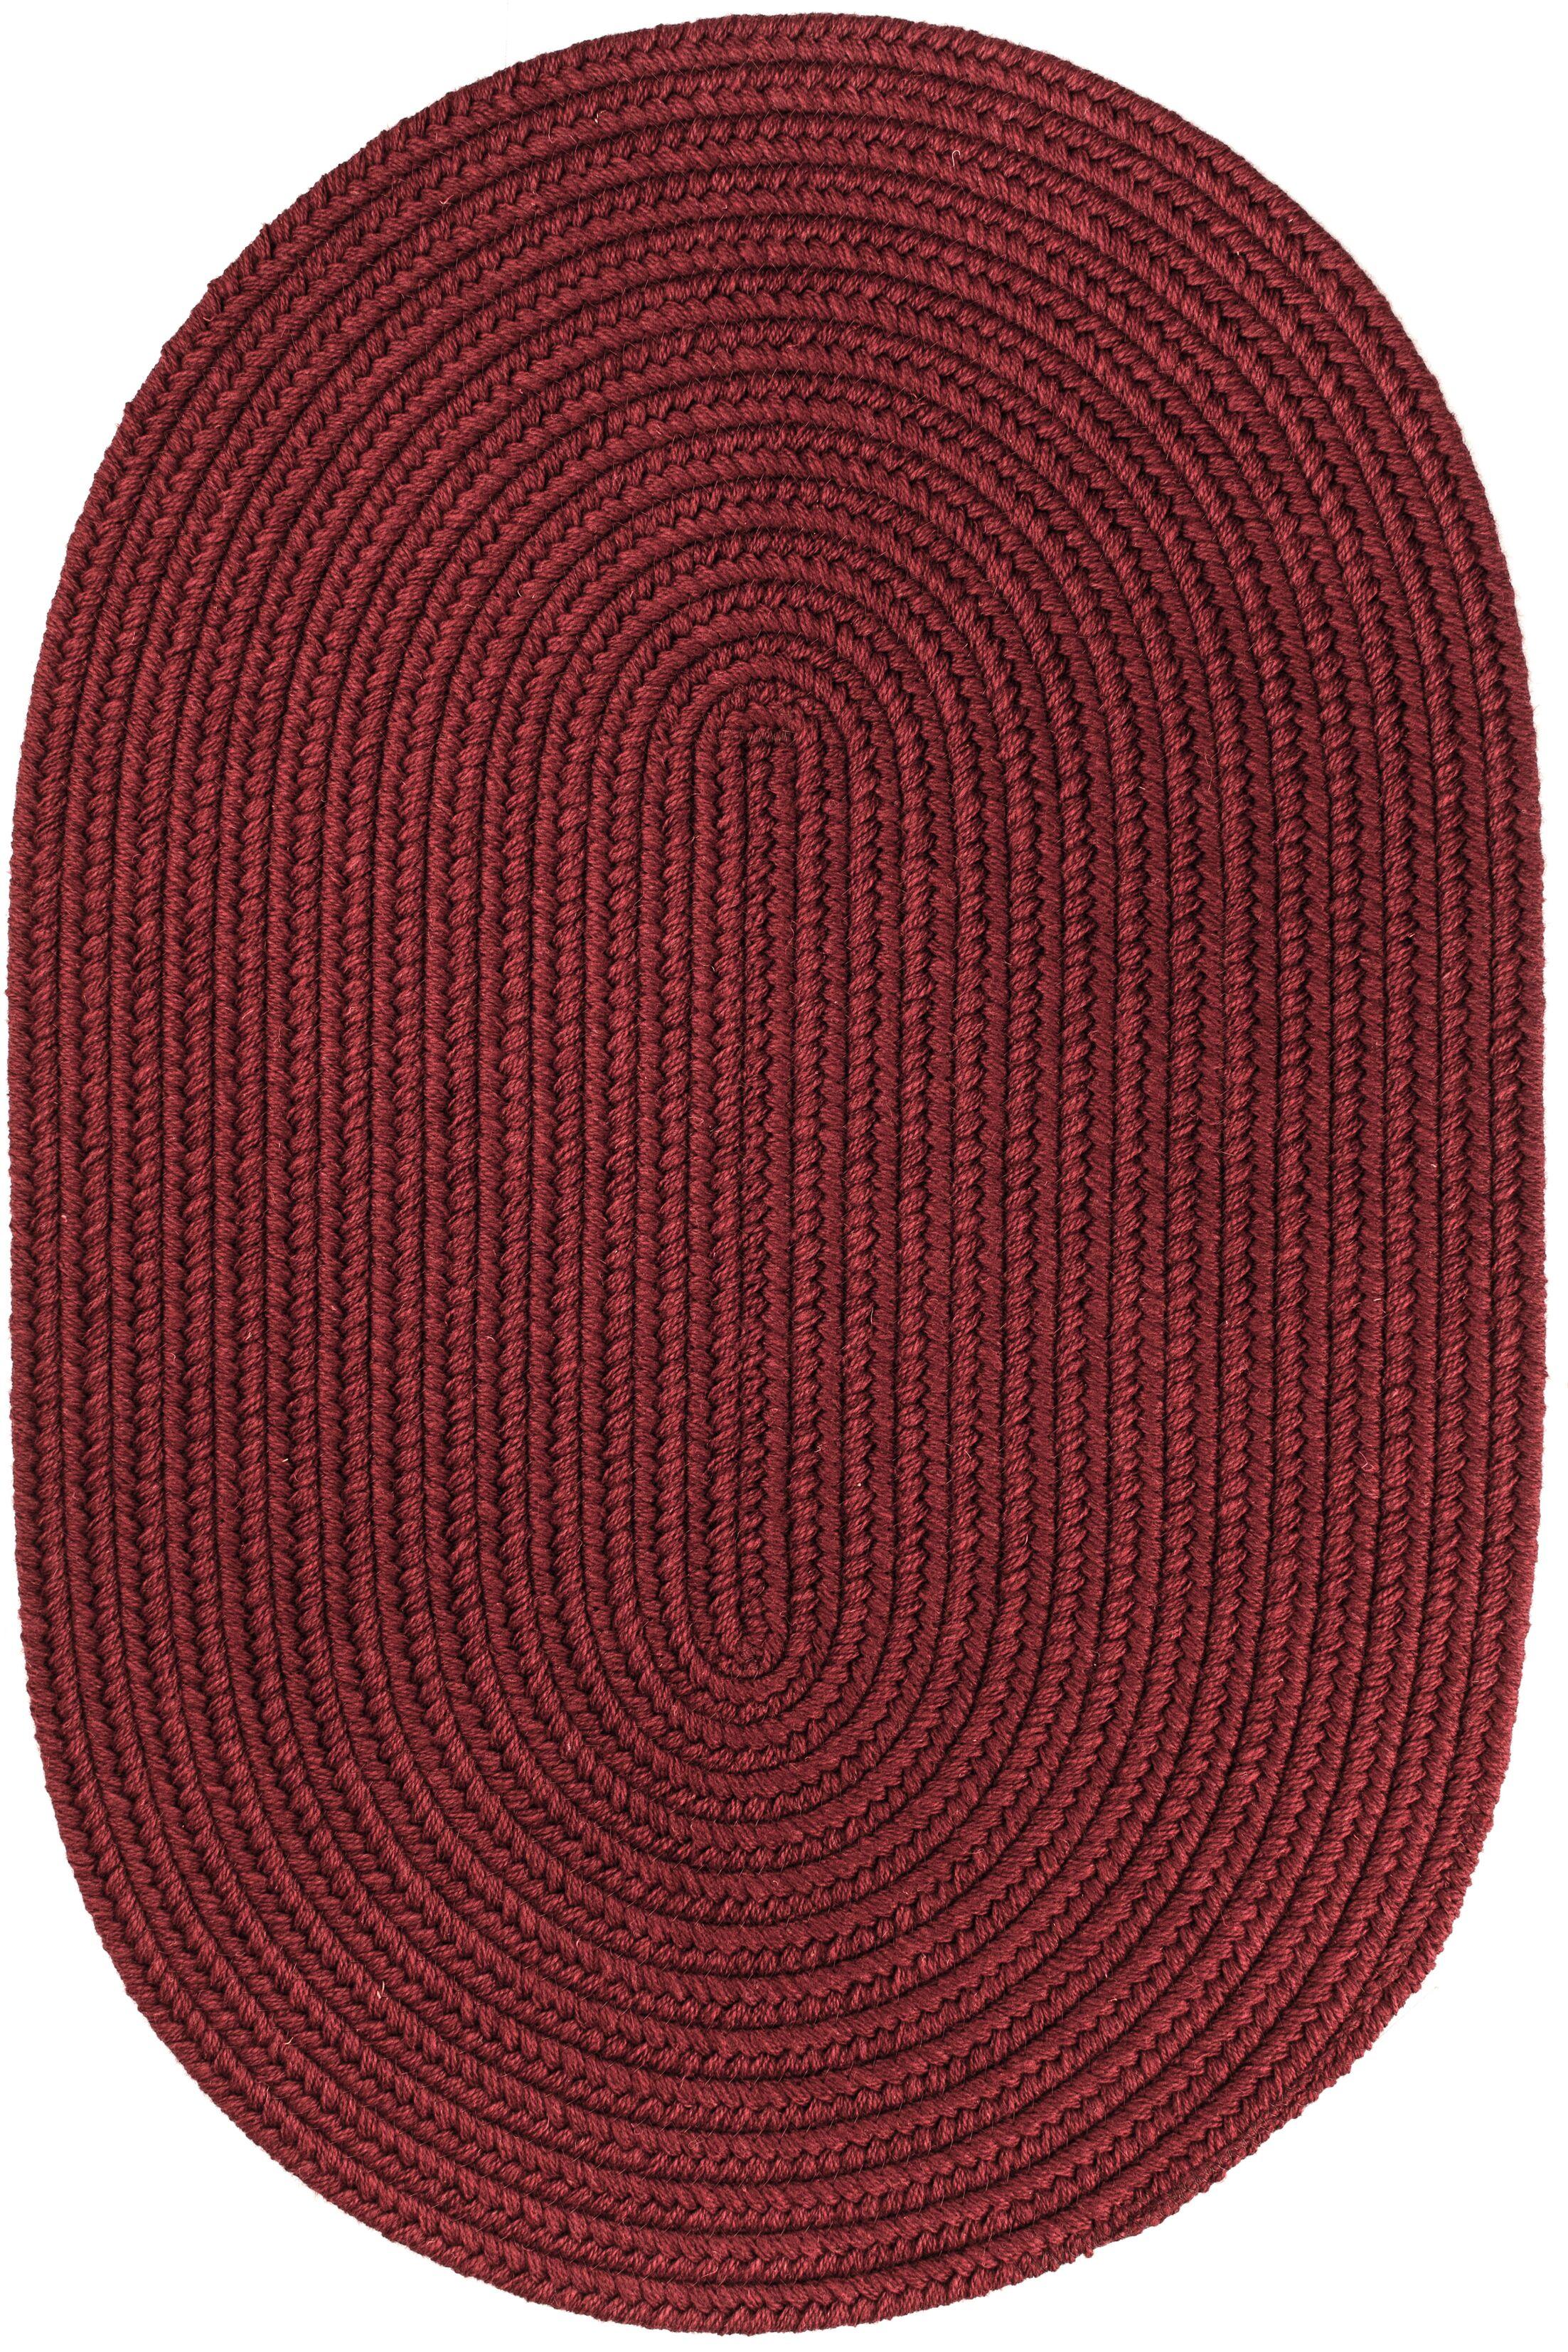 Handmade Red Wine Area Rug Rug Size: Oval 4' x 6'